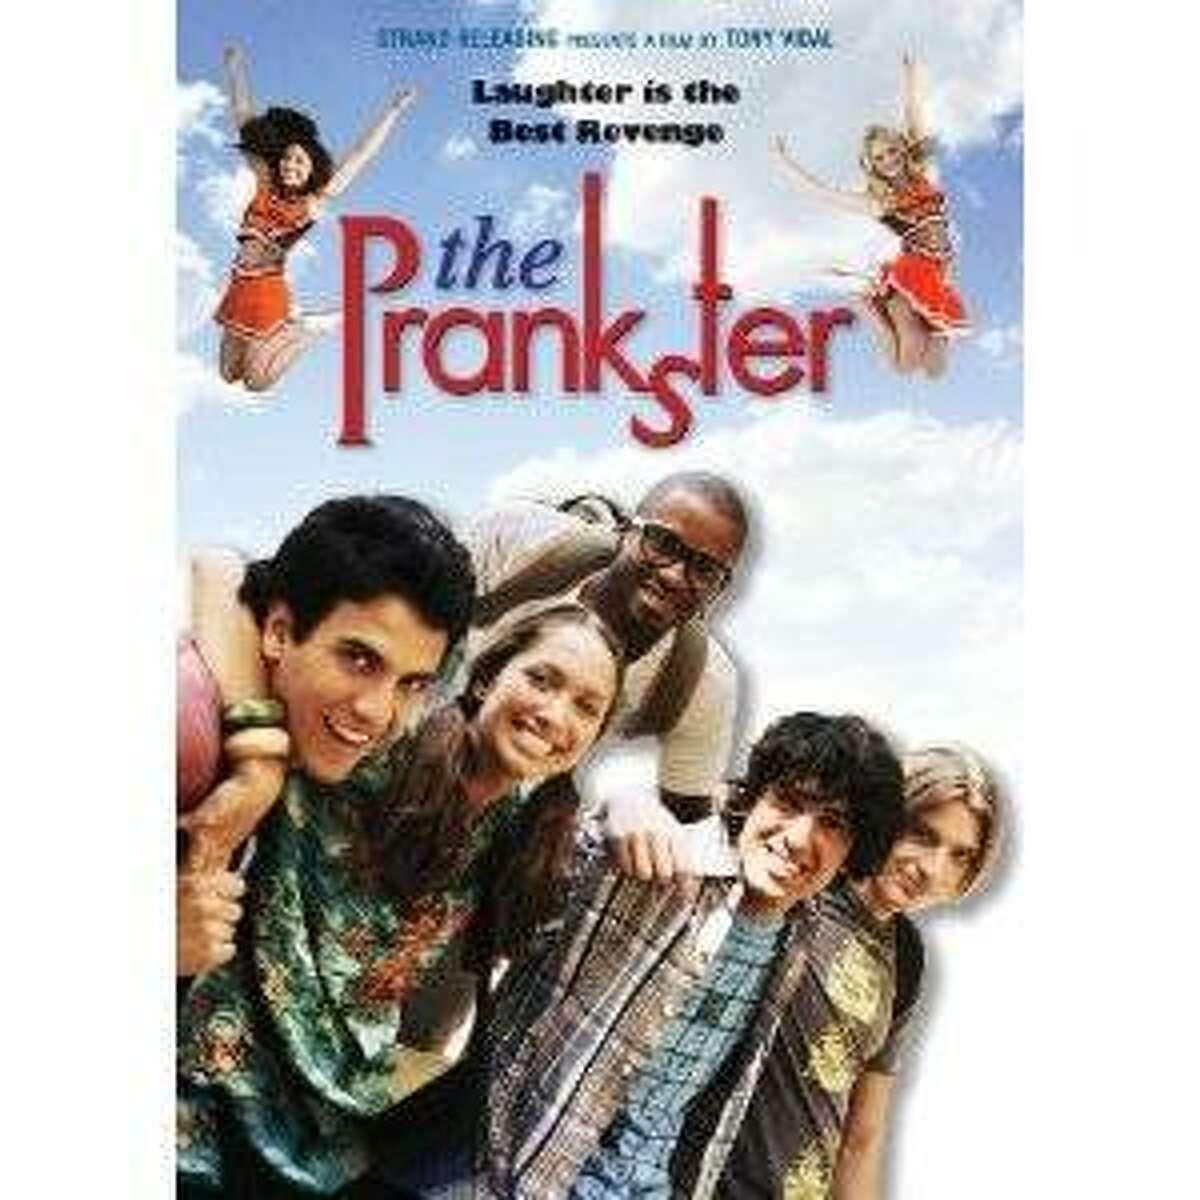 dvd cover THE PRANKSTER